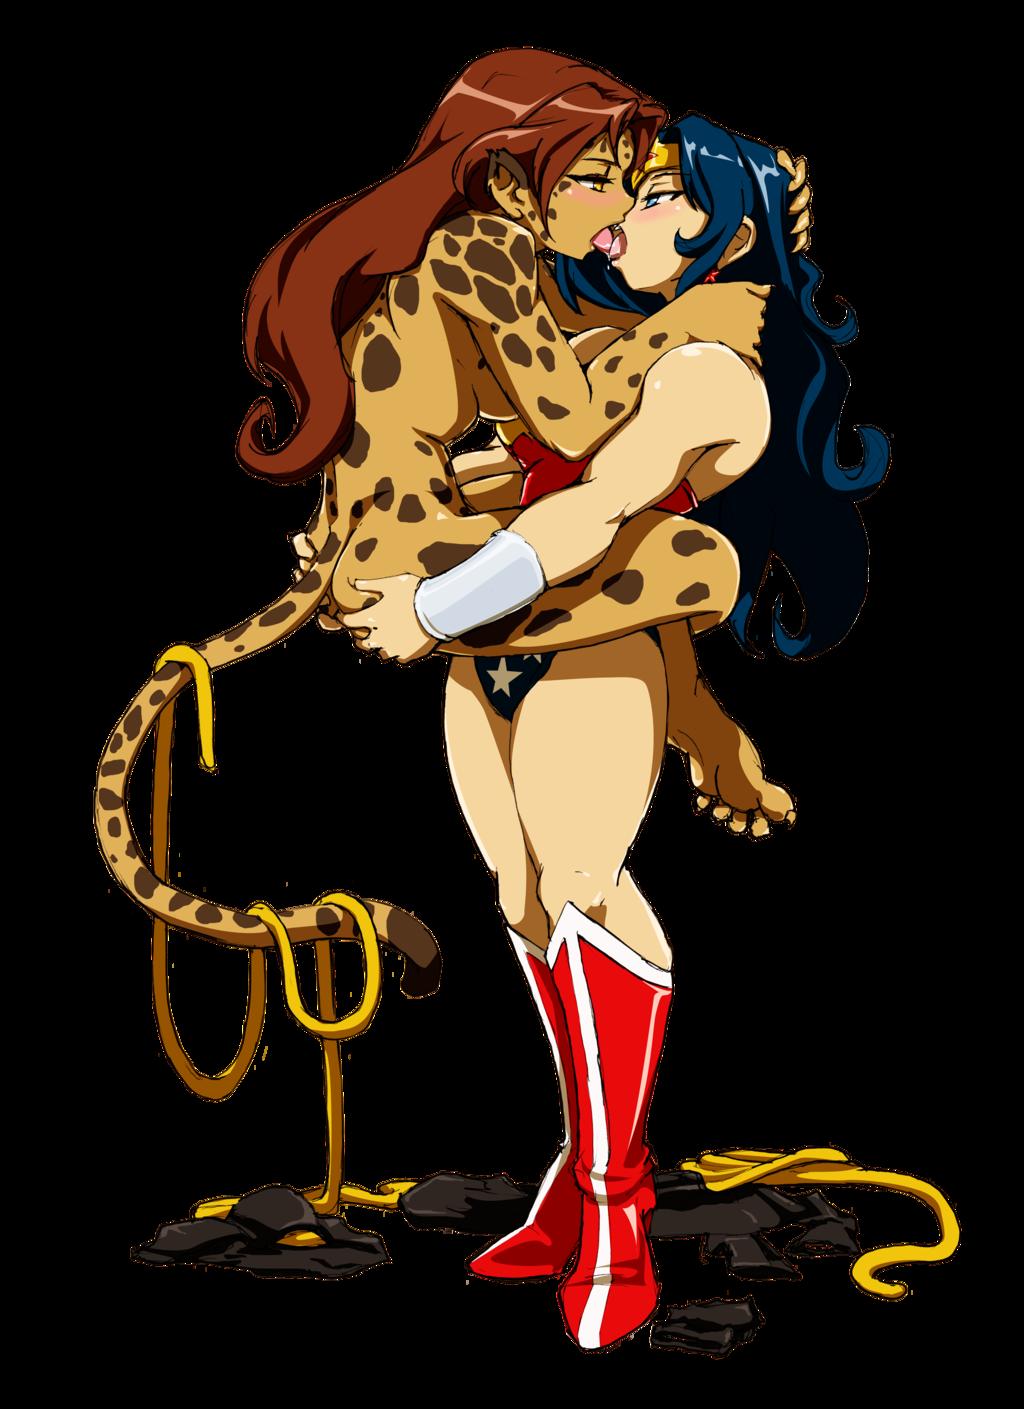 Cheetah & Wonder Woman | Cheetahs | Pinterest